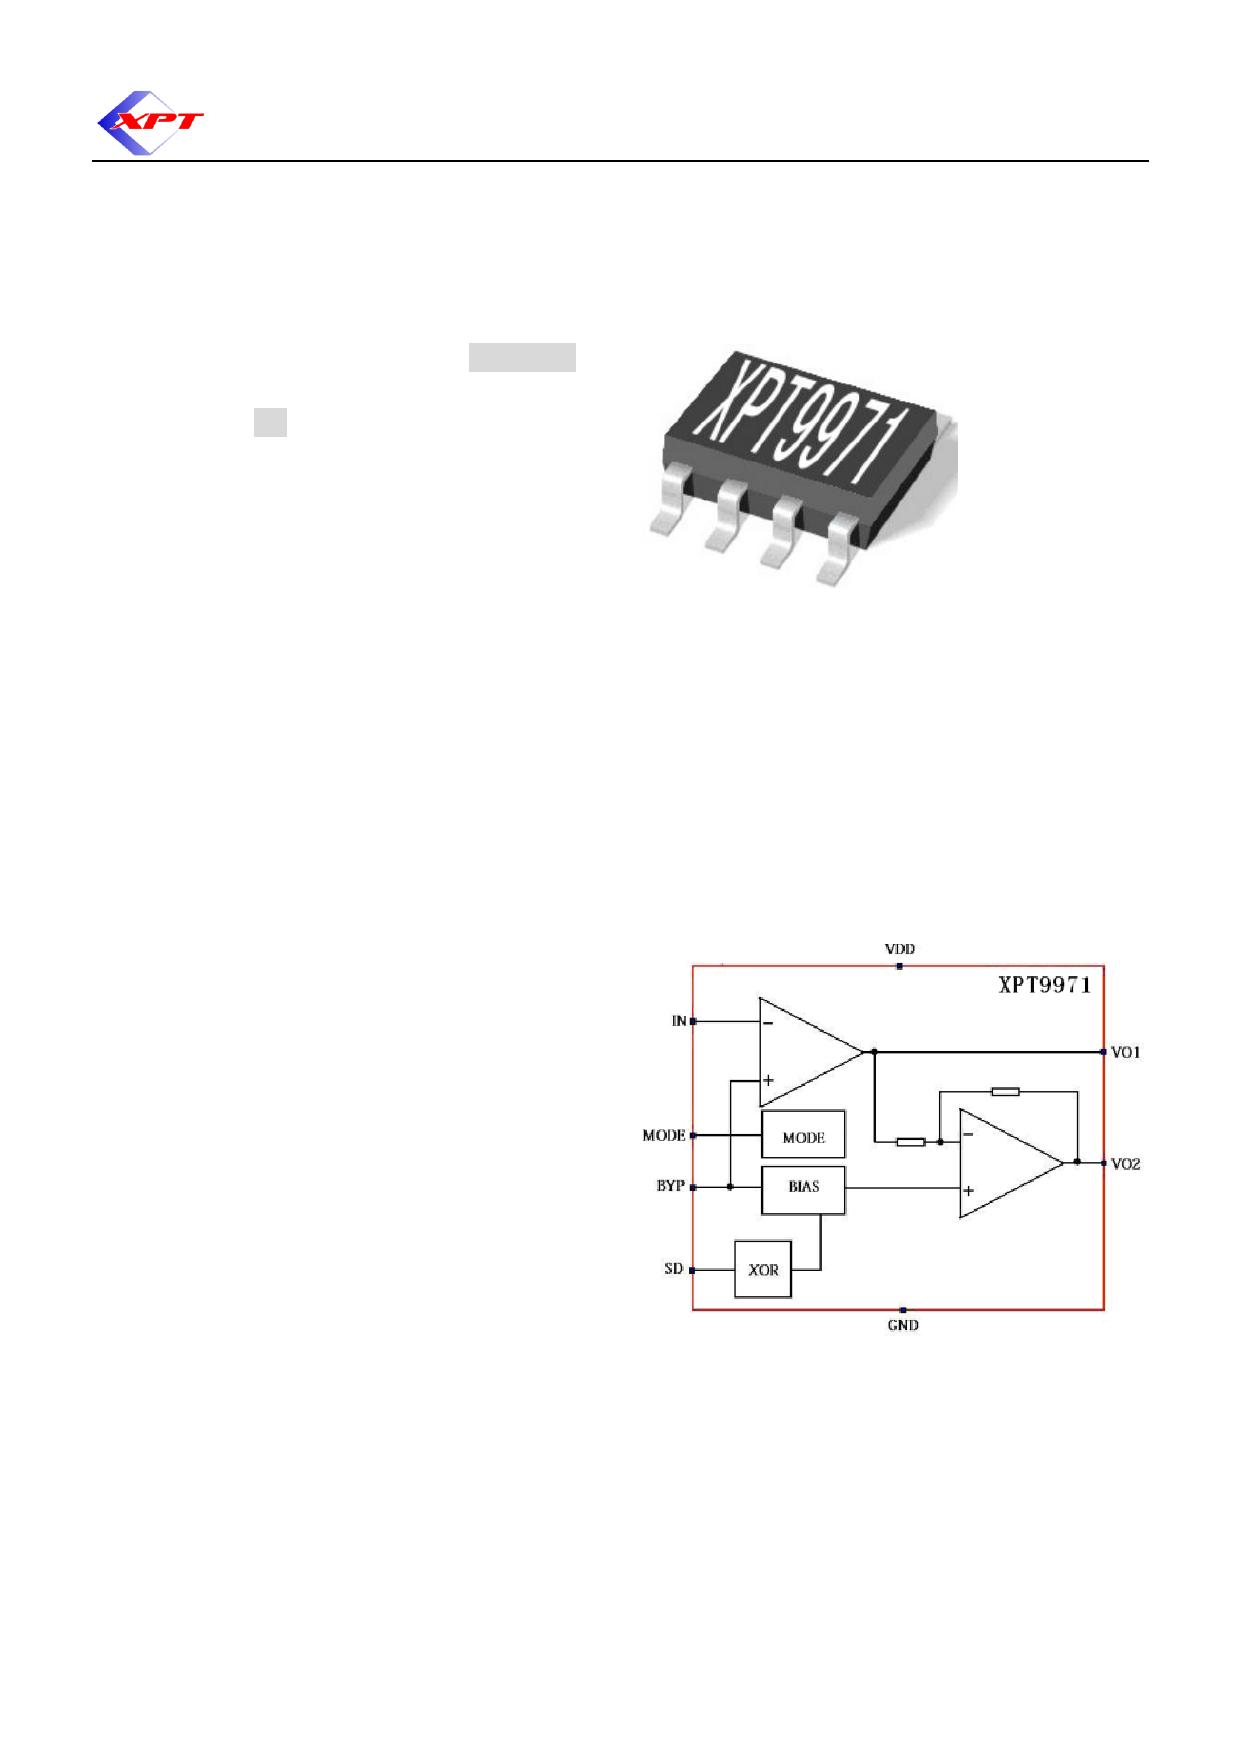 XPT9971ES pdf, schematic